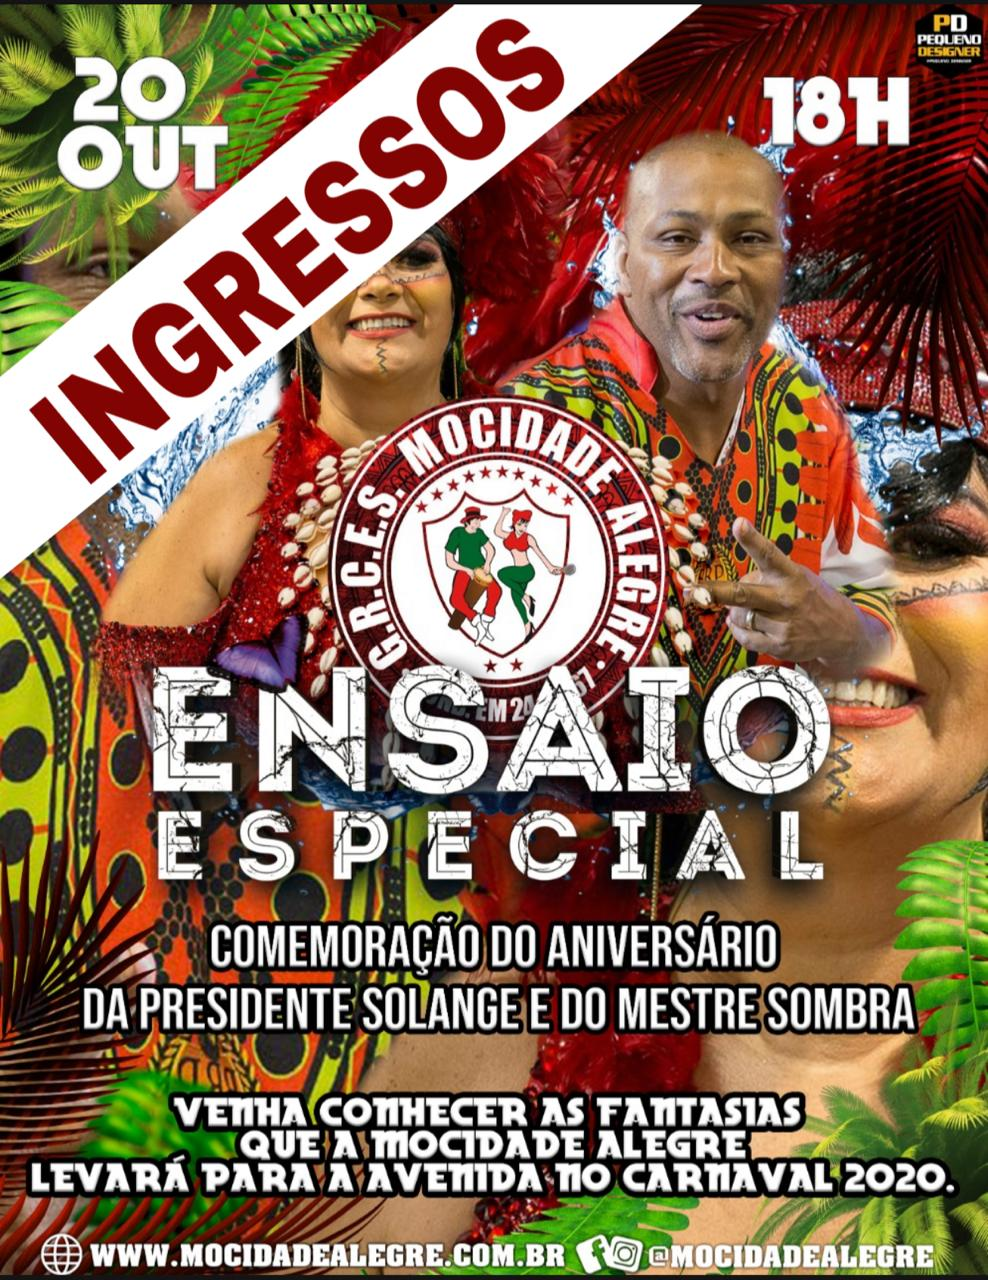 INGRESSO - 20-10 - ENSAIO CARNAVAL 2020  - Mocidade Alegre